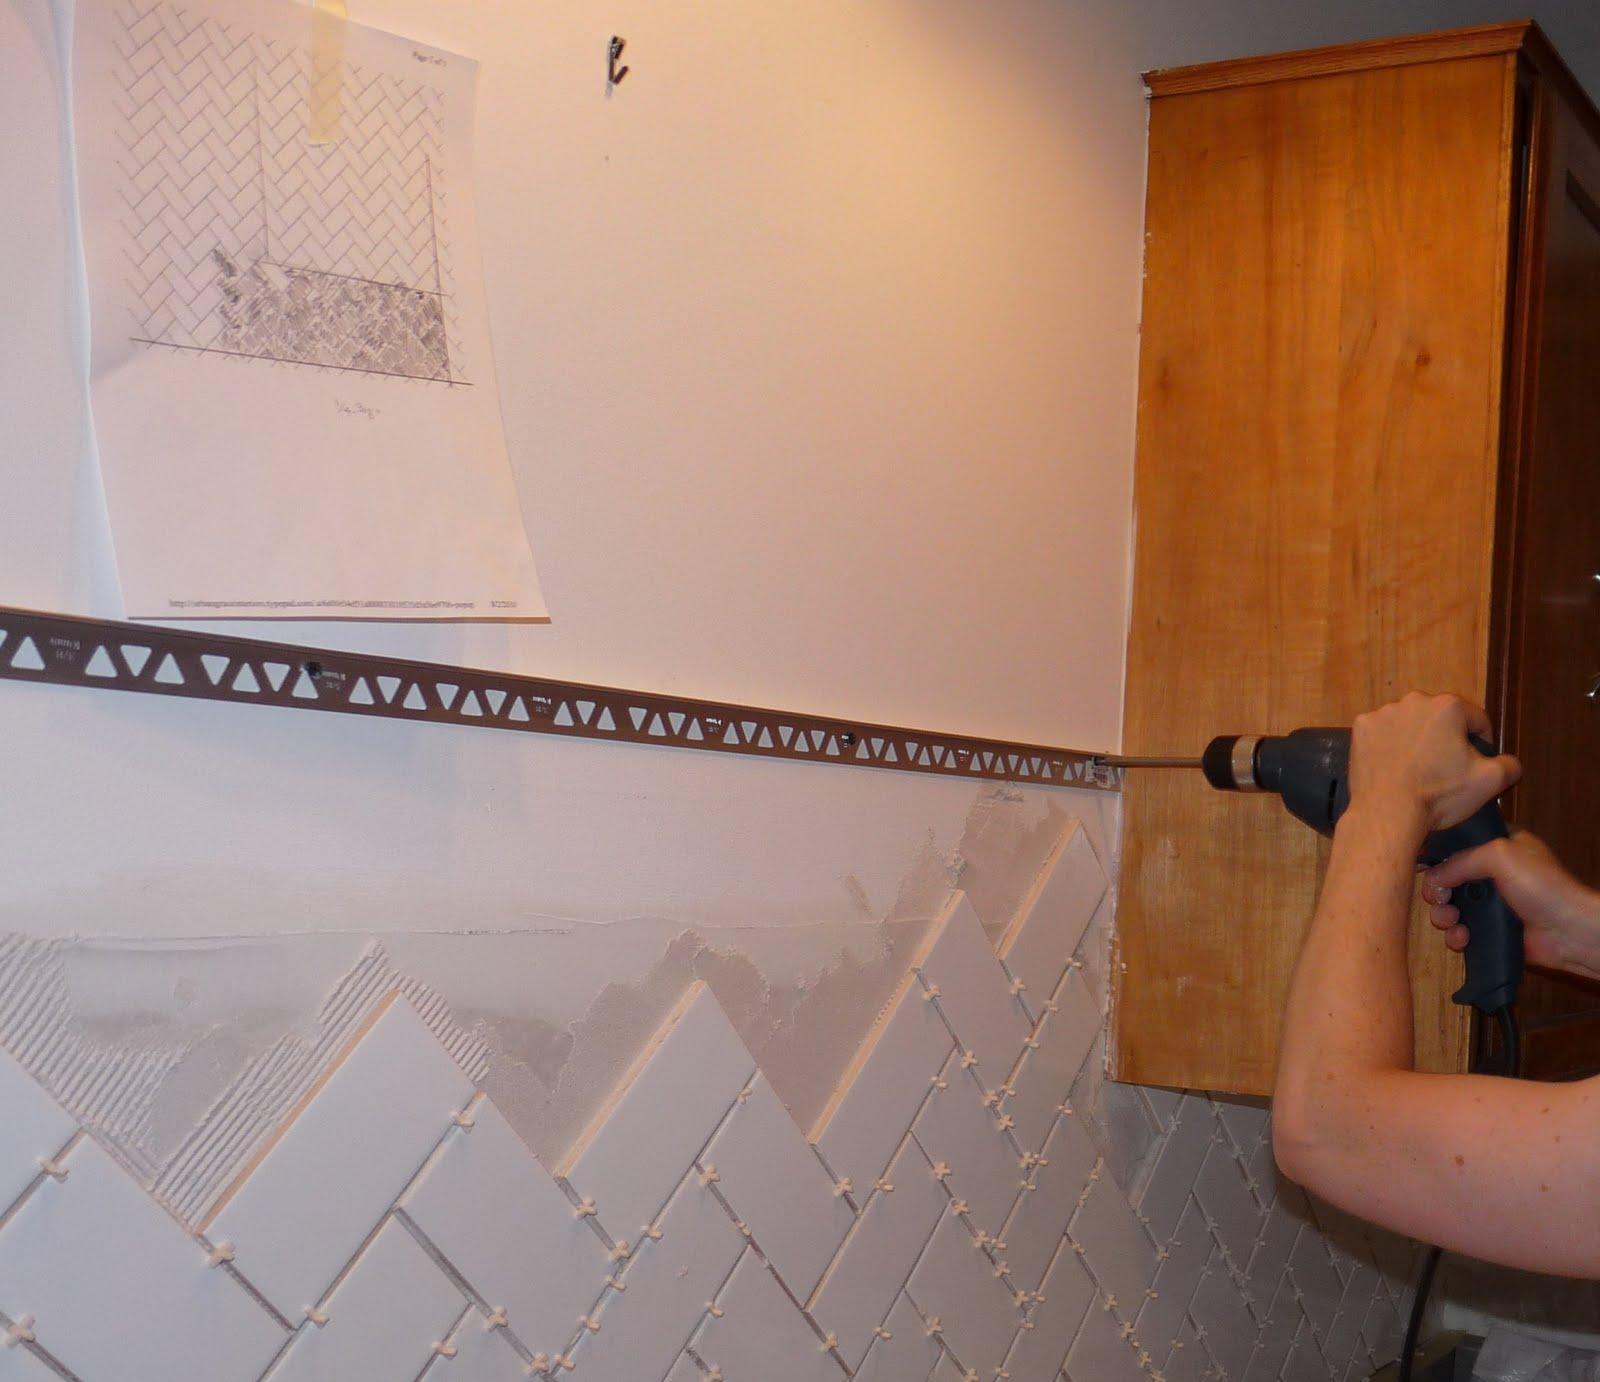 Subway Tile Finished Edge Finishing Tile With Metal Edging | Dans le Lakehouse